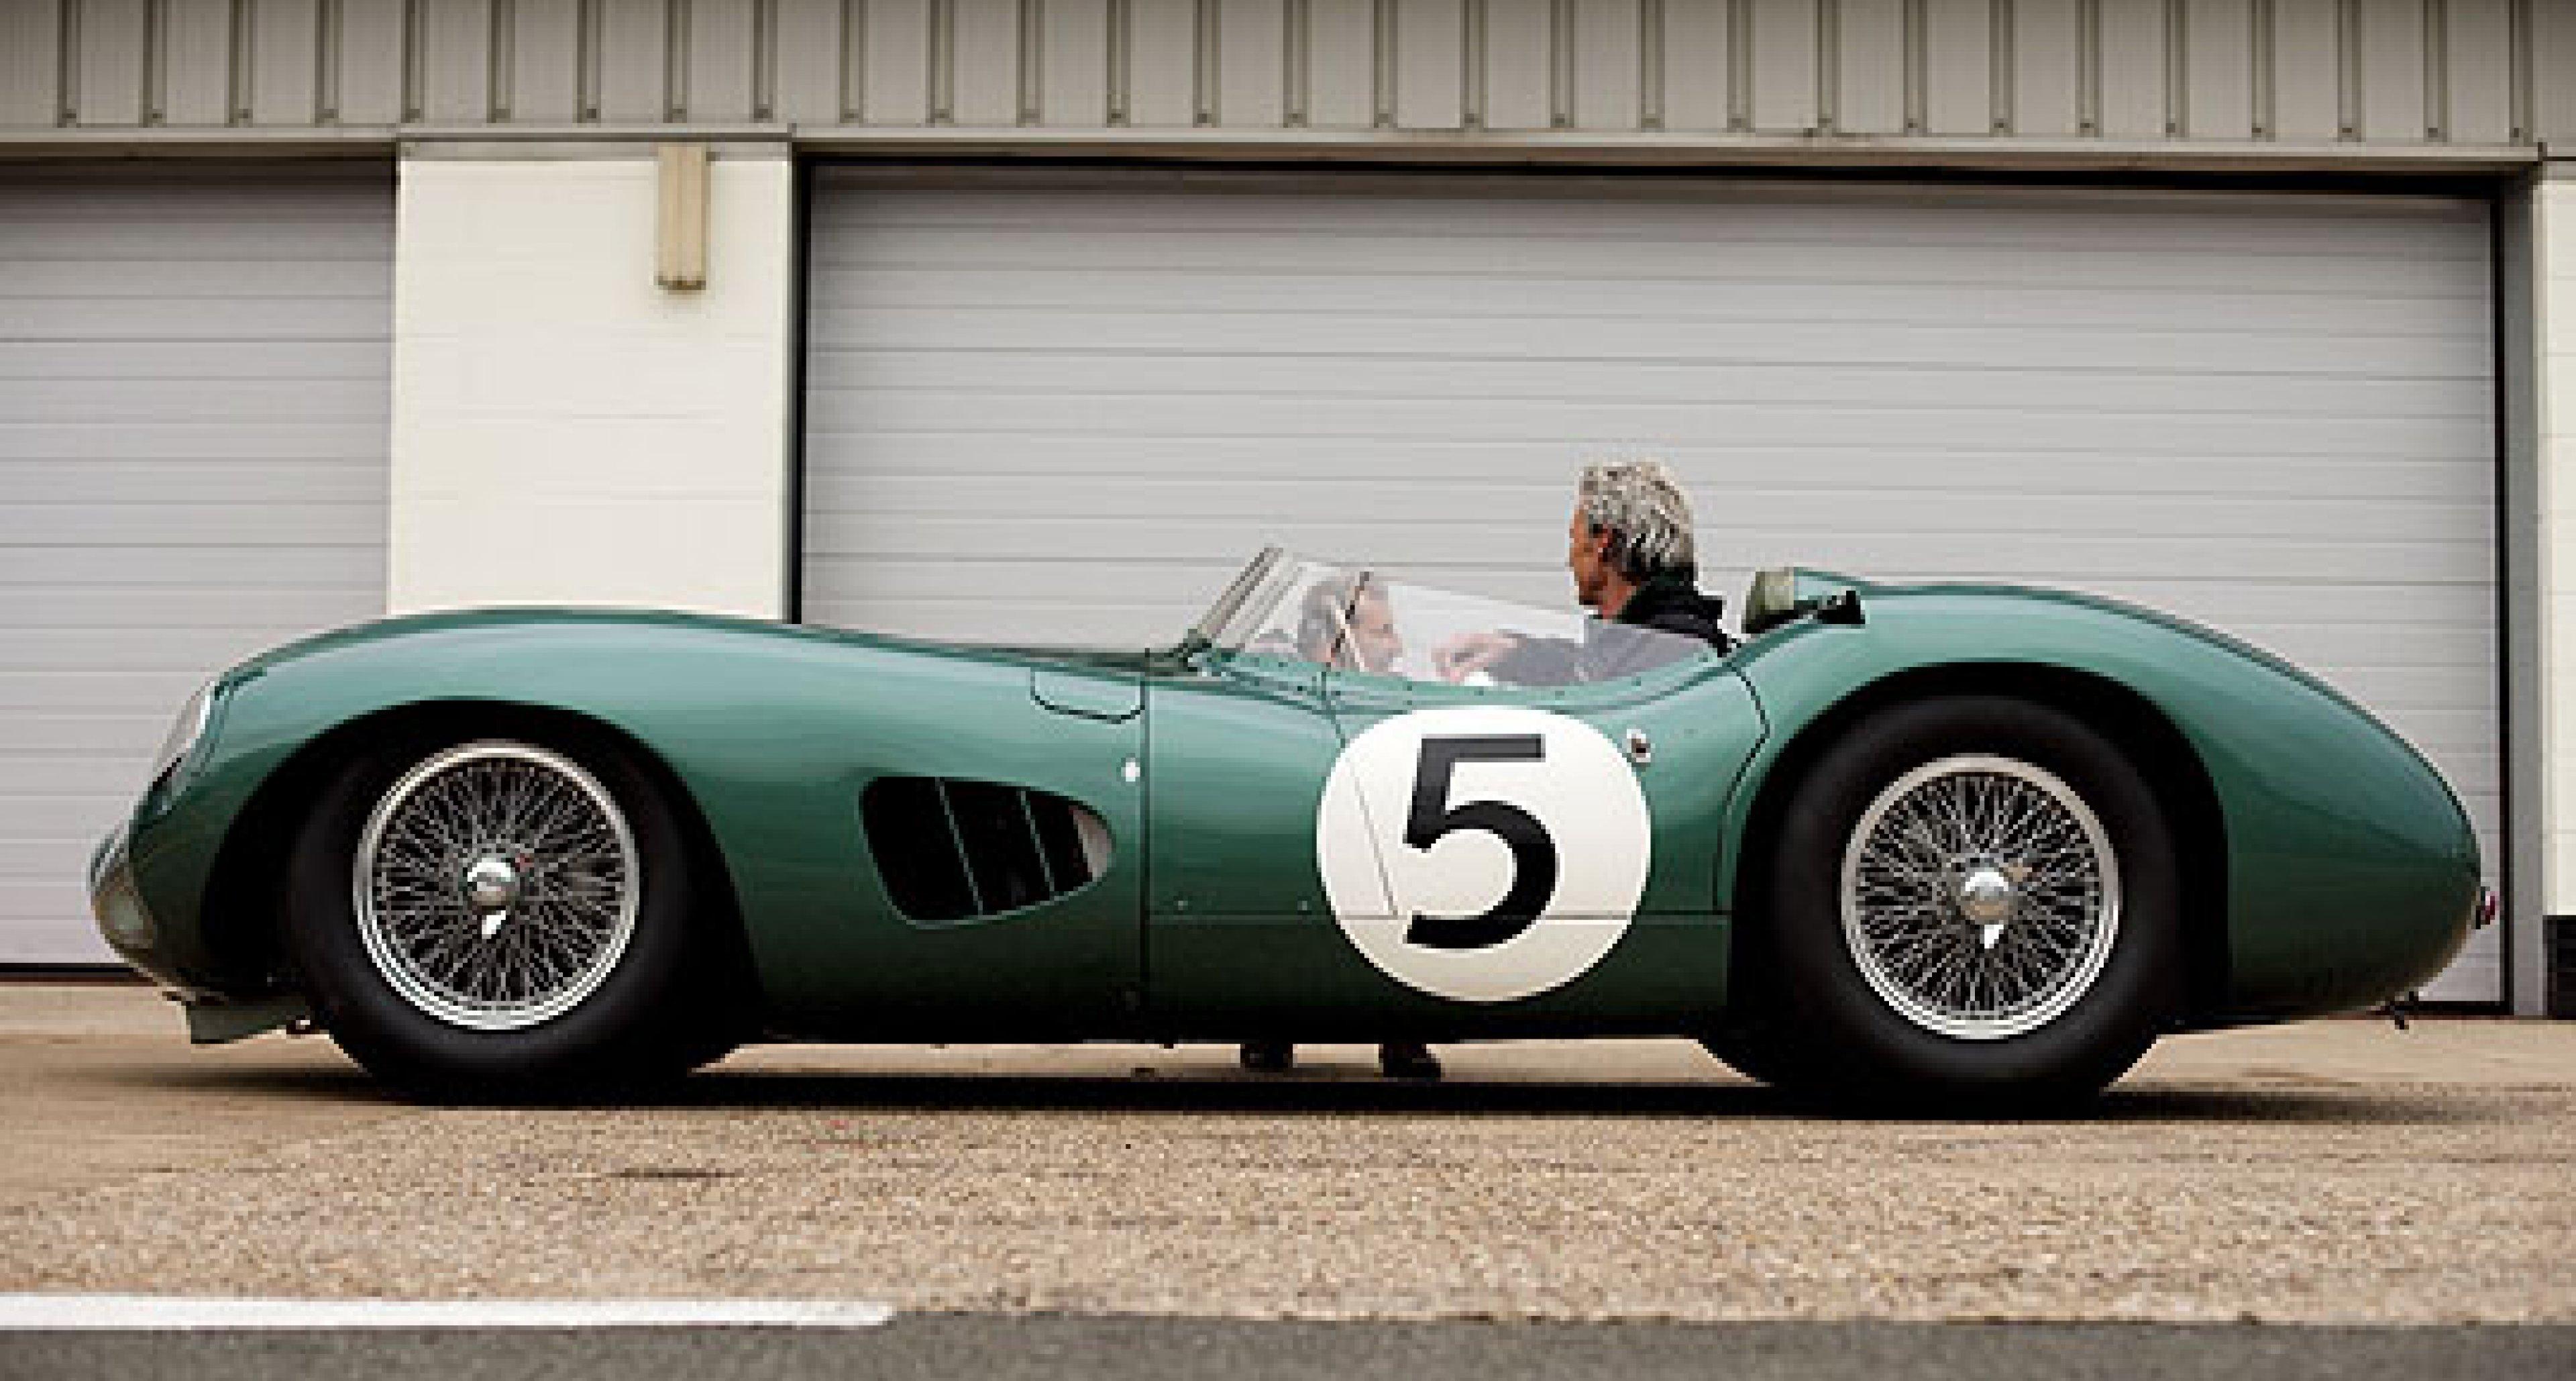 Aston Martin Racing: 50 Years On, a Championship Awaits